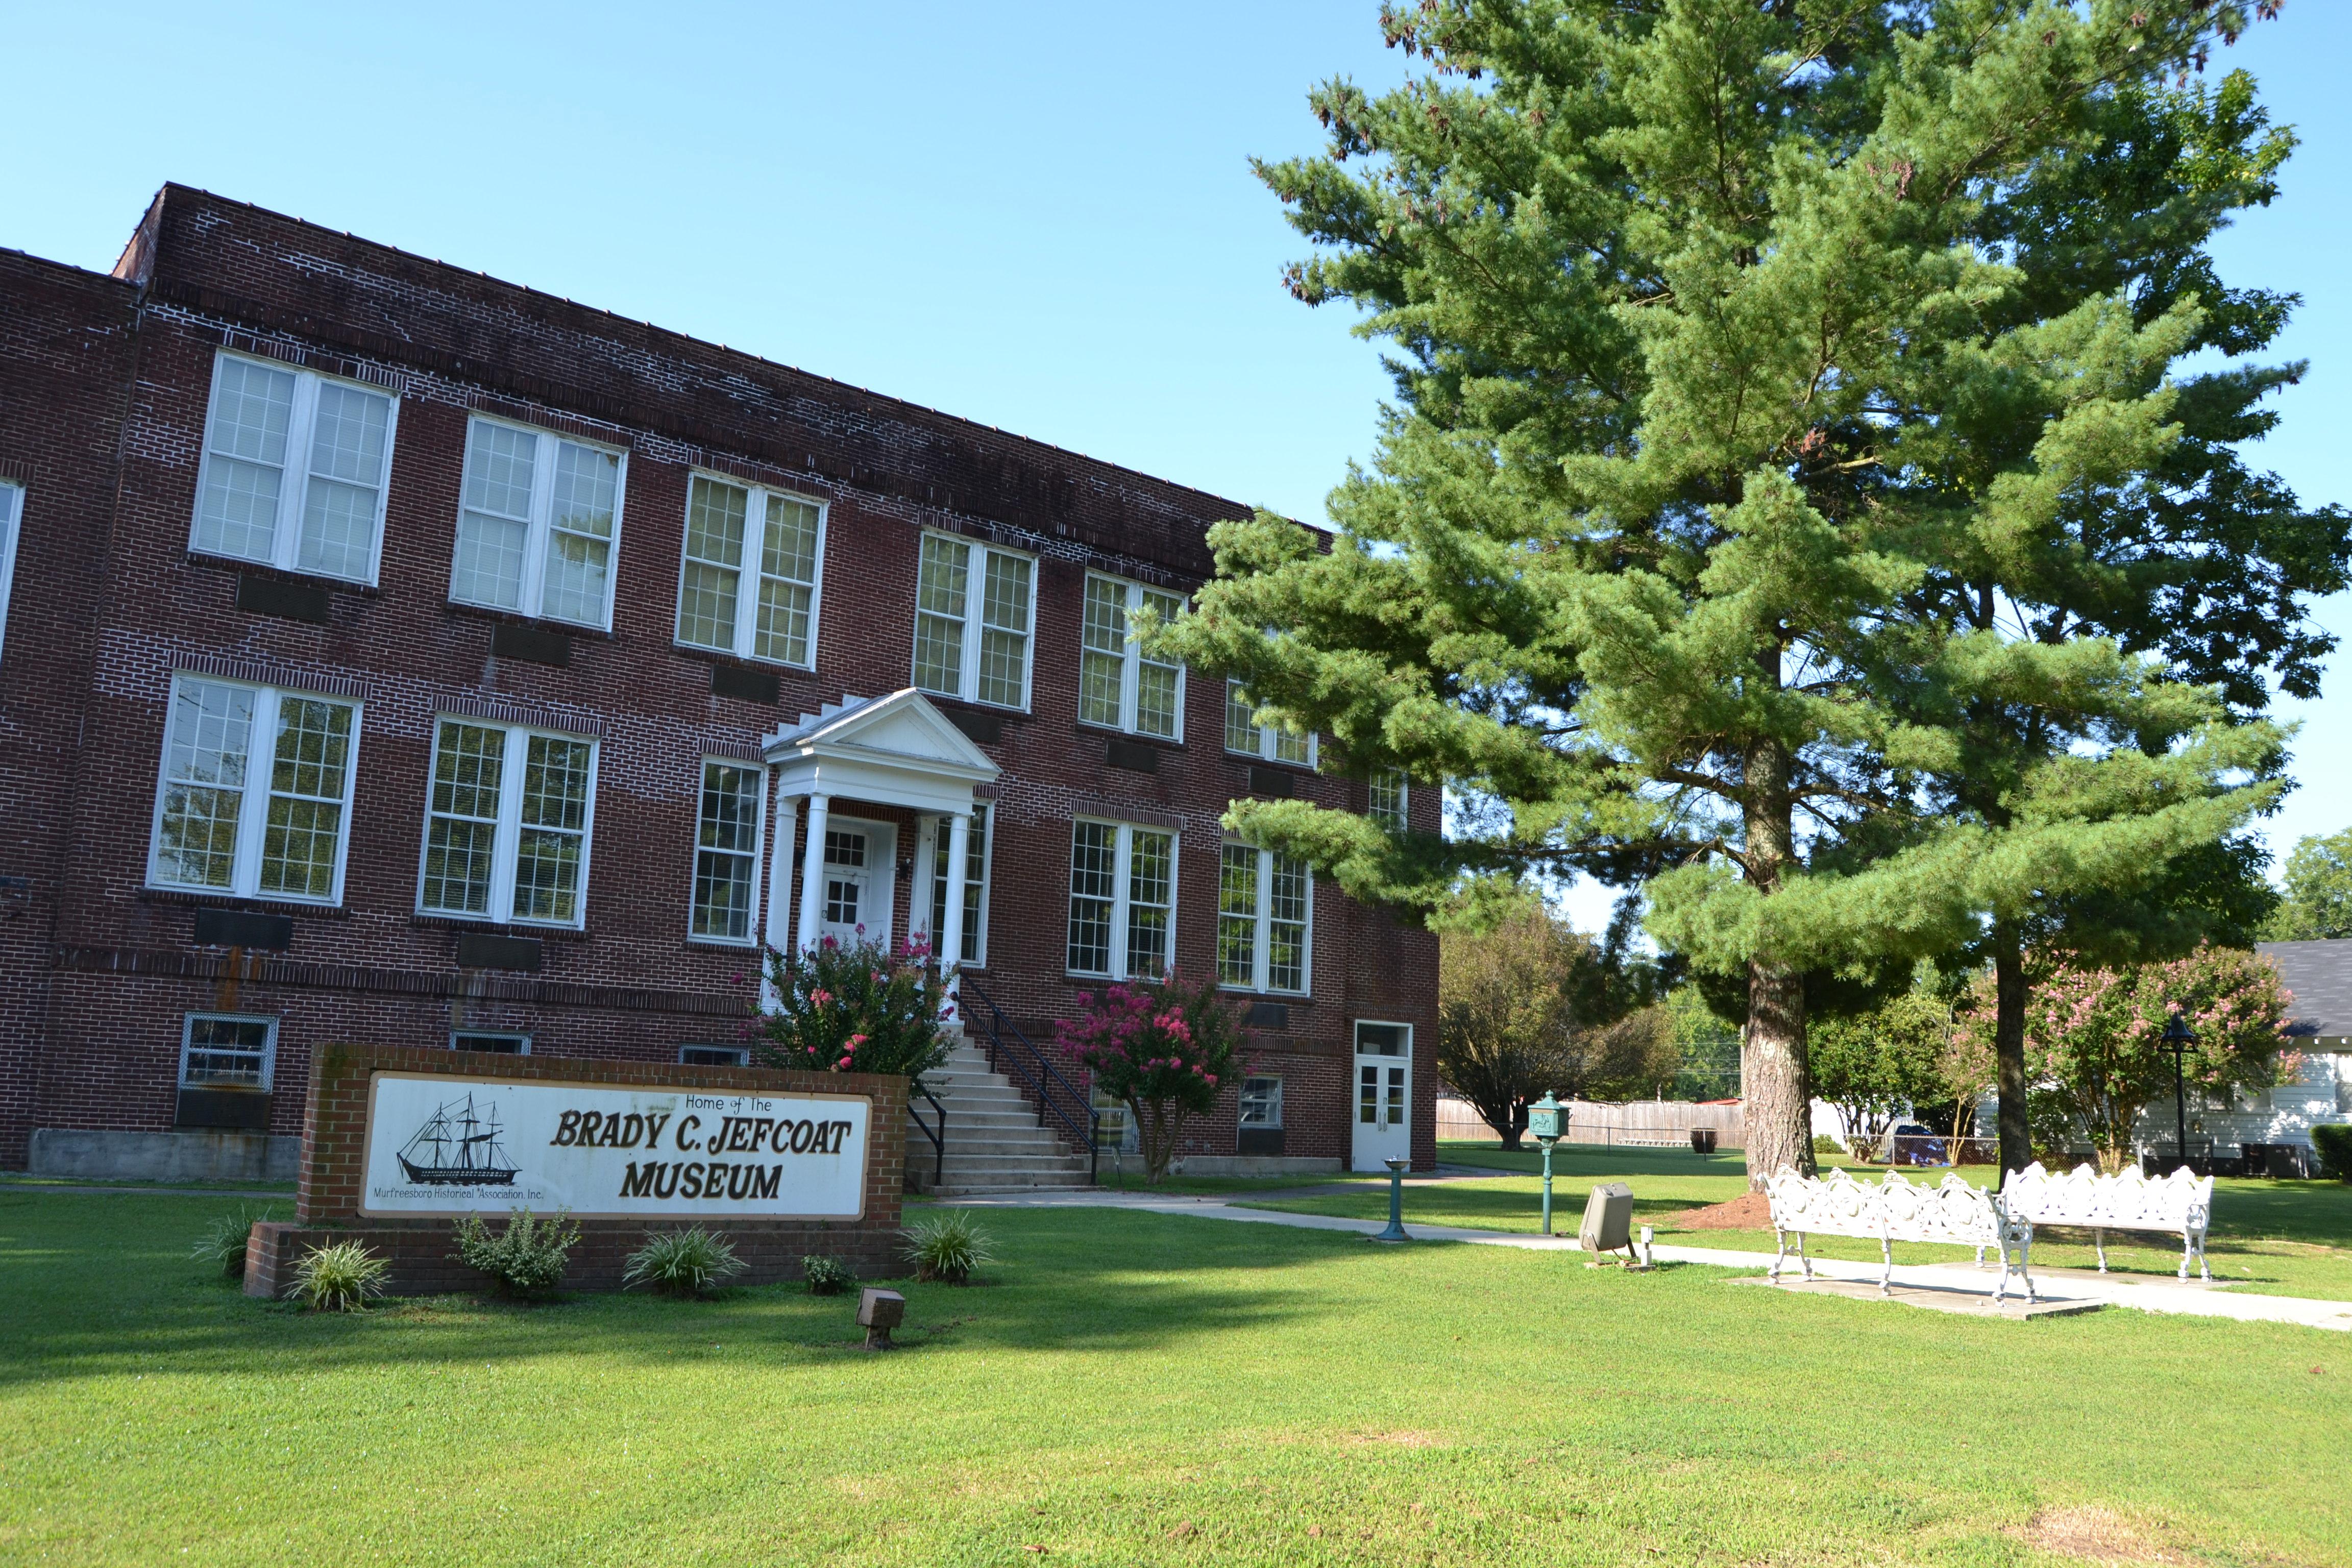 The Brady C Jefcoat Museum